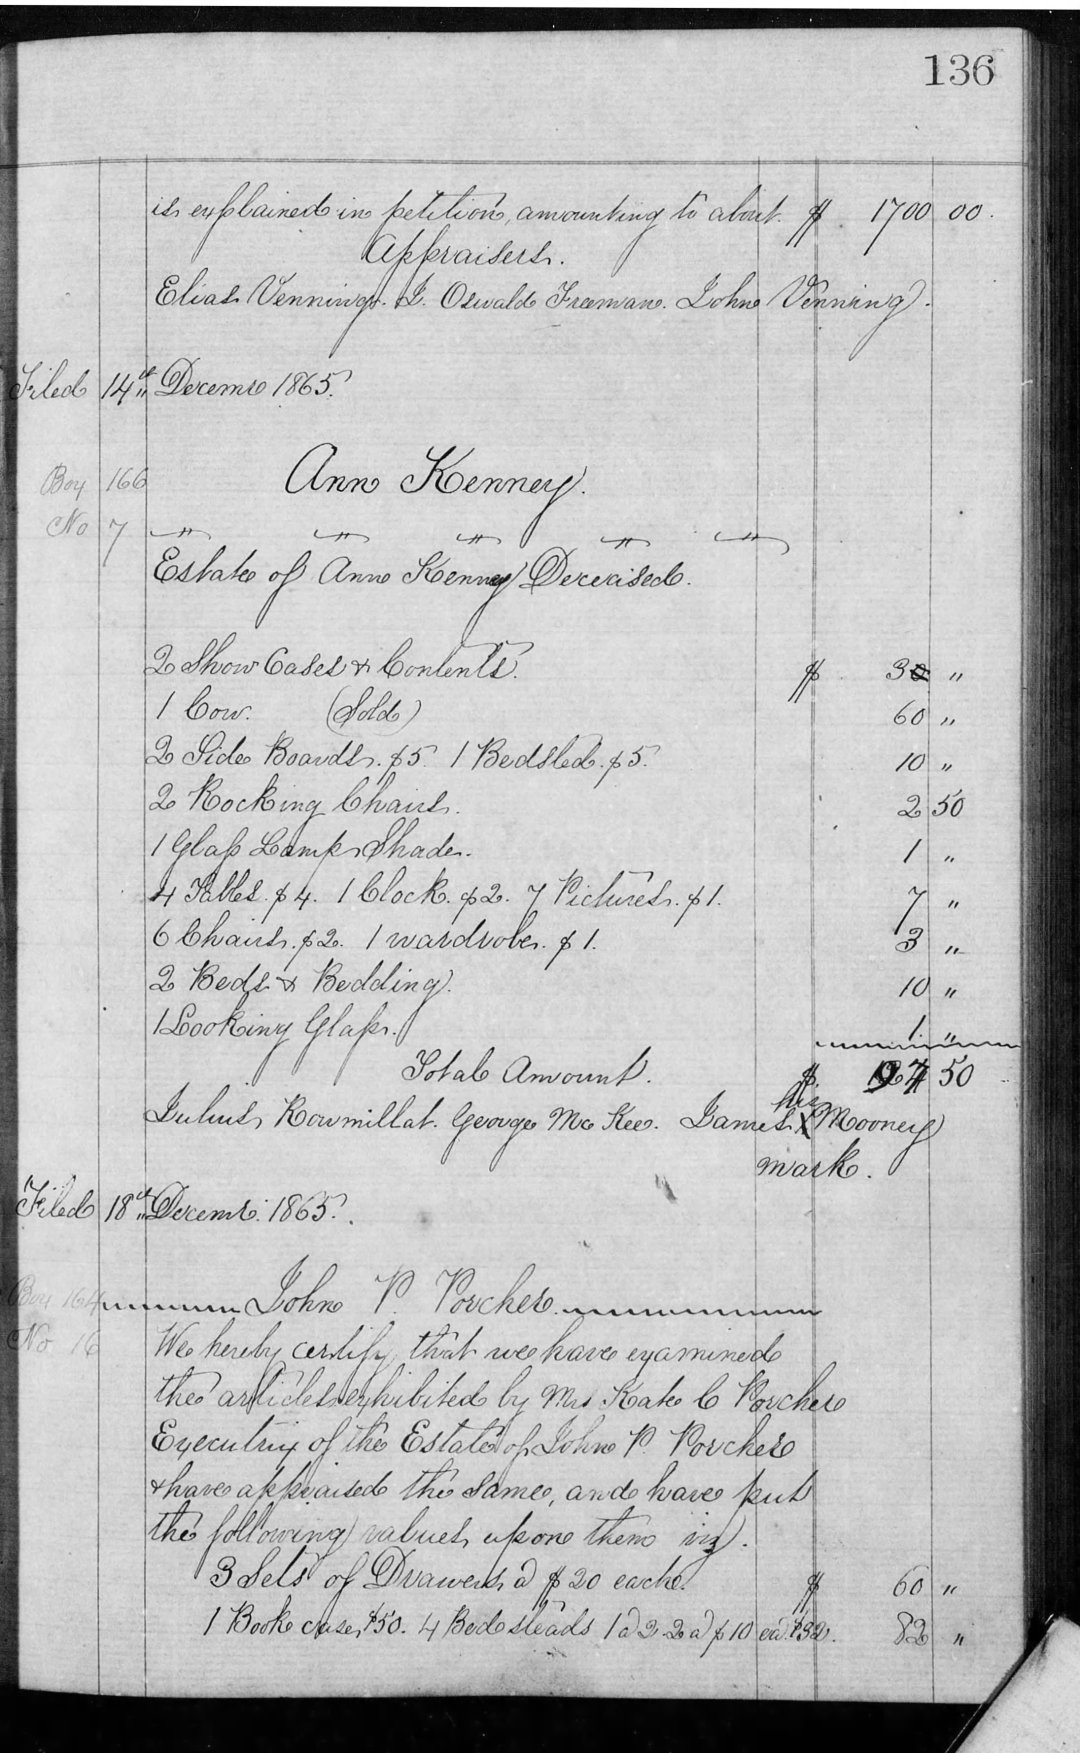 Porcher John P Est Inv Book G (1864-67) p136